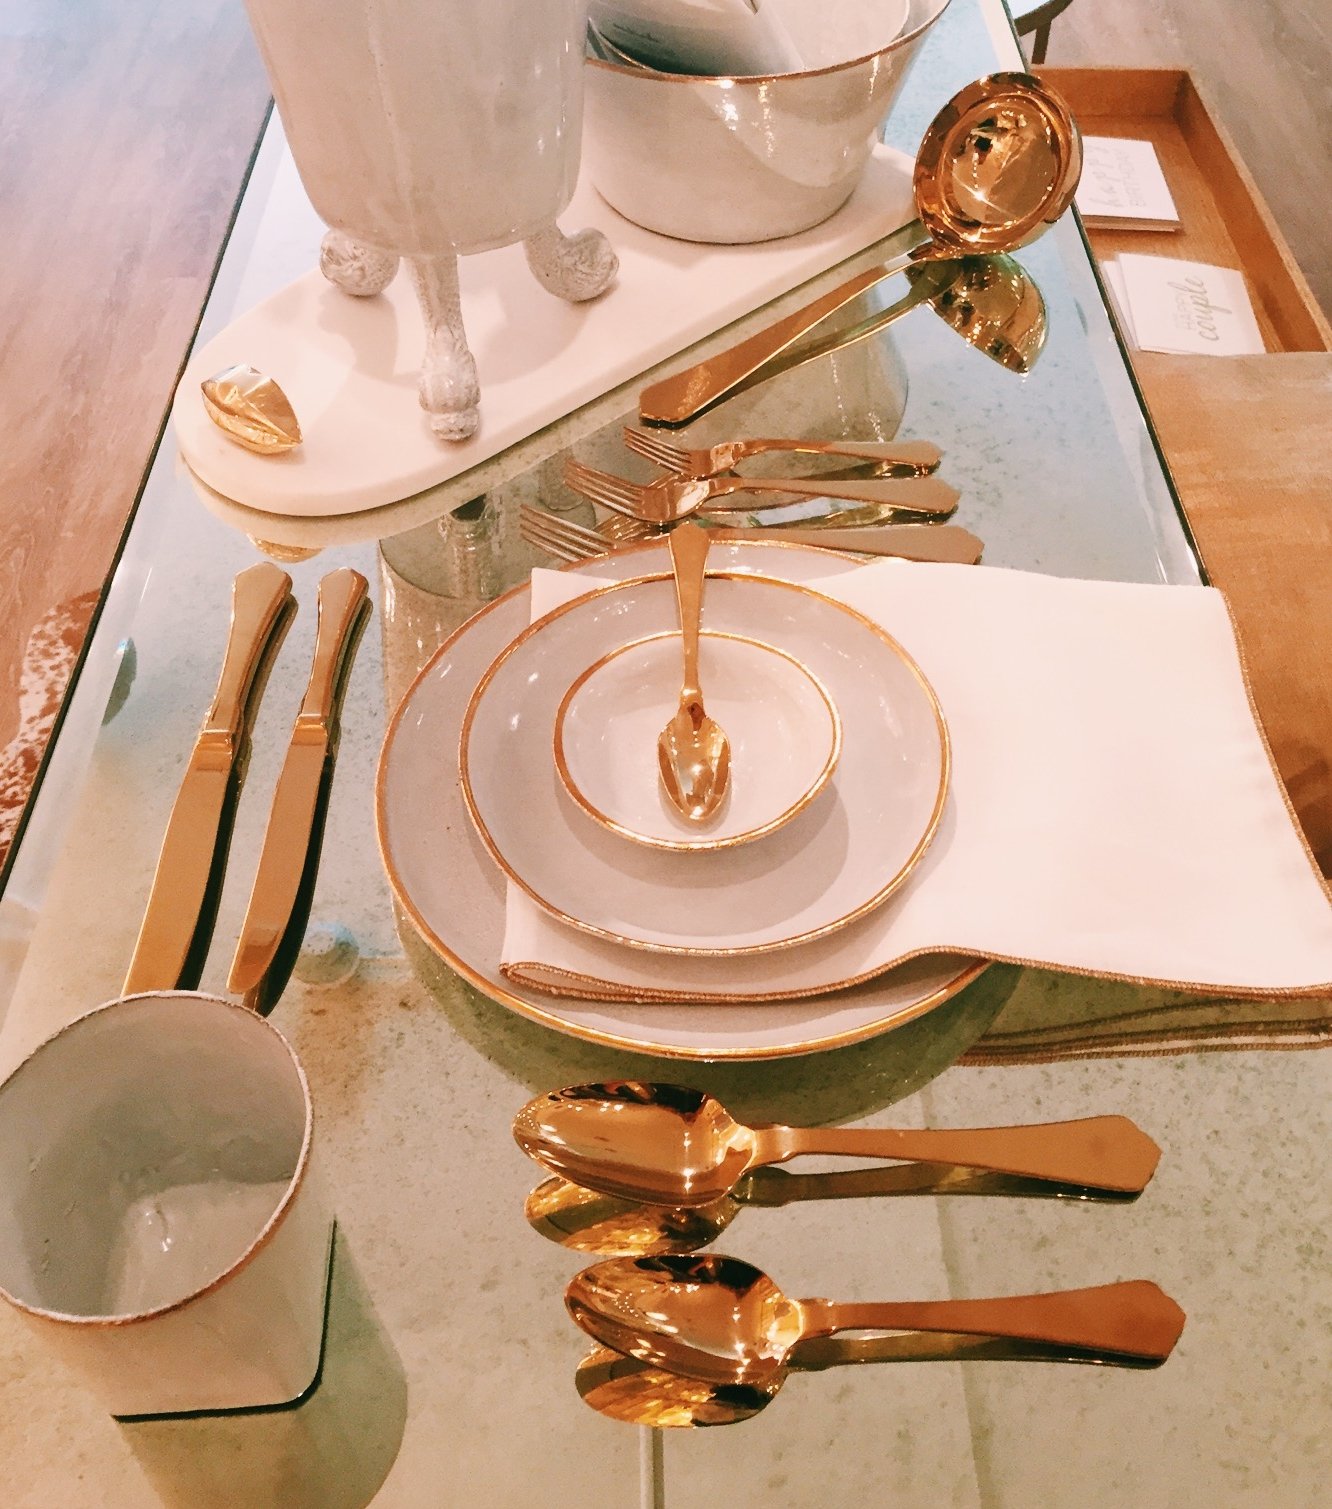 Fine china selection at Modern Duke Home Decor.